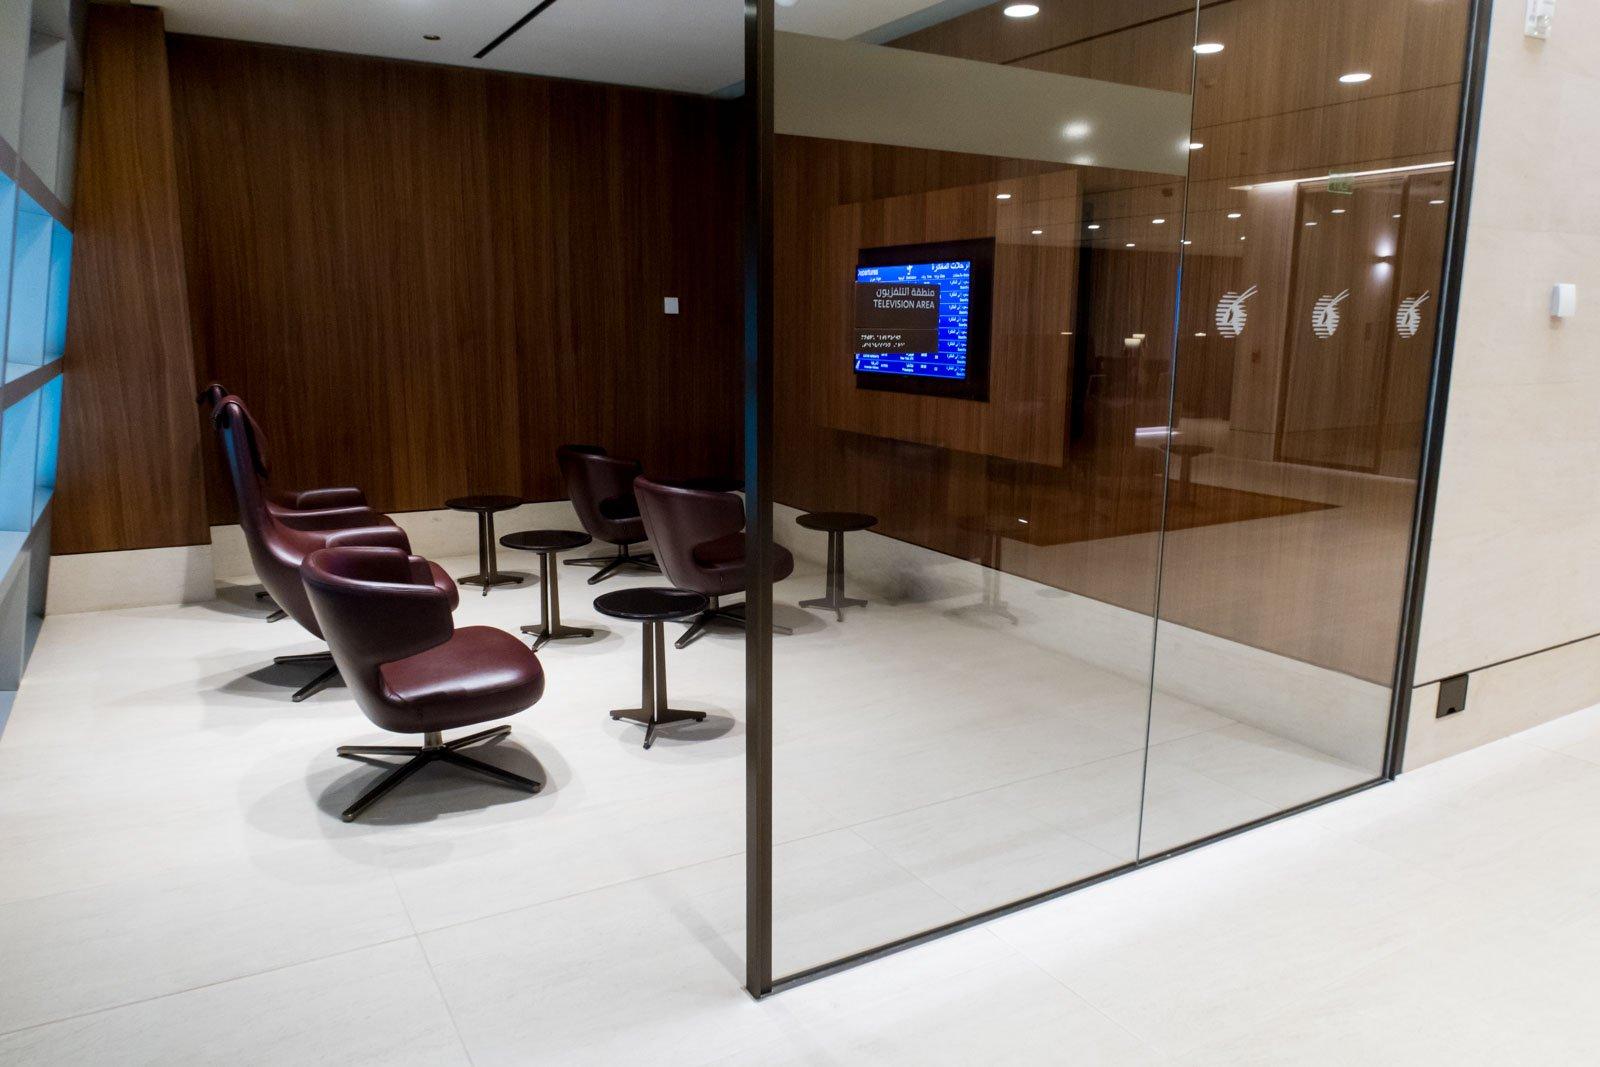 TV Room in Qatar Airways Arrivals Lounge in Doha